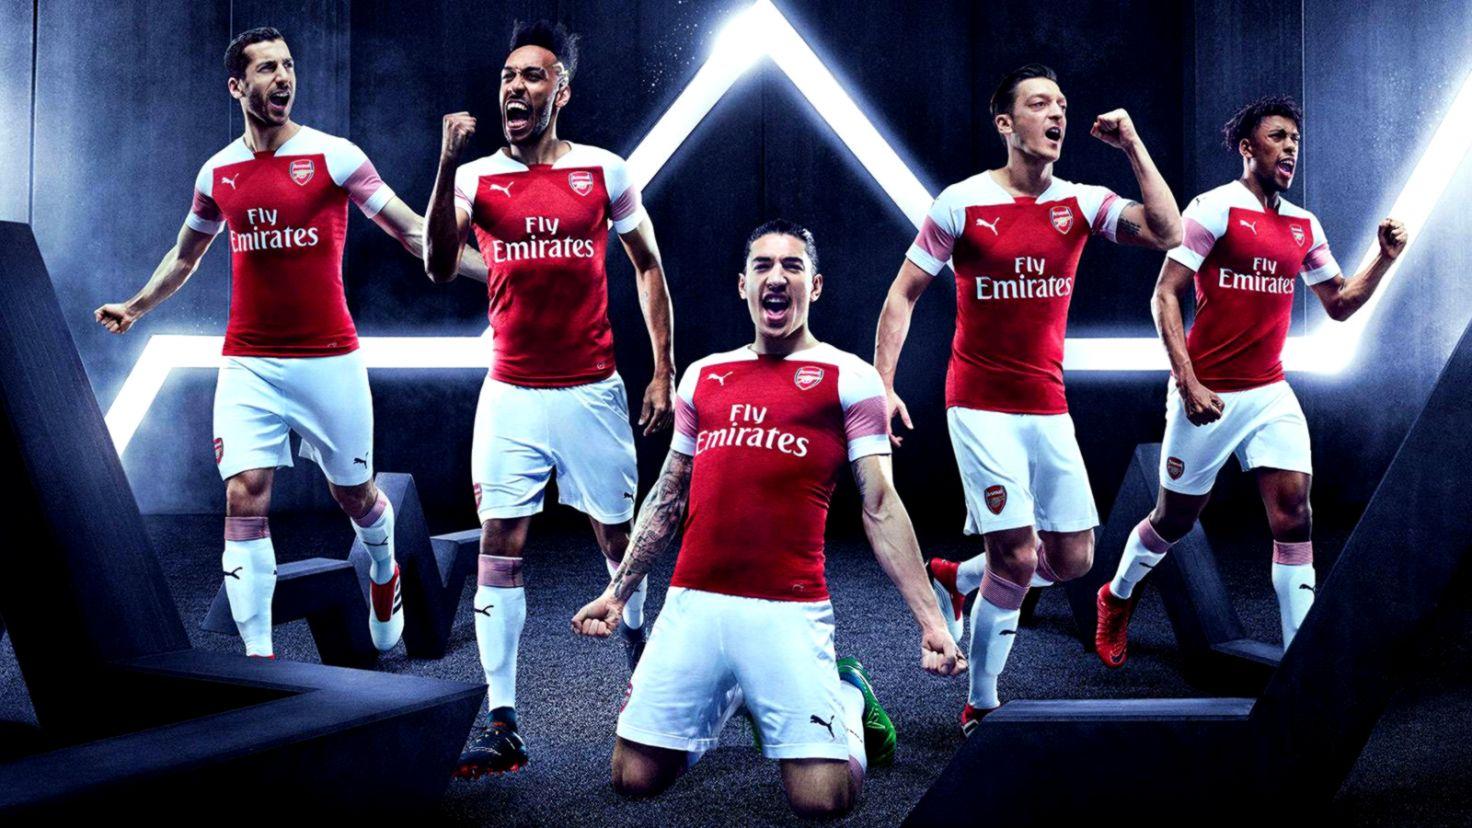 084c25c95a5 Arsenal FC 201819 PUMA Home Kit – FOOTBALL